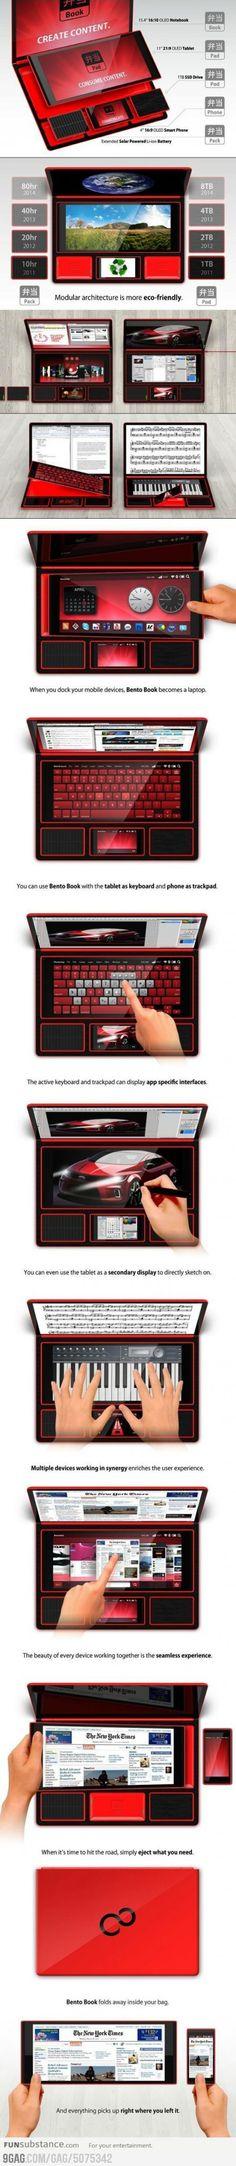 Futuristic computer design